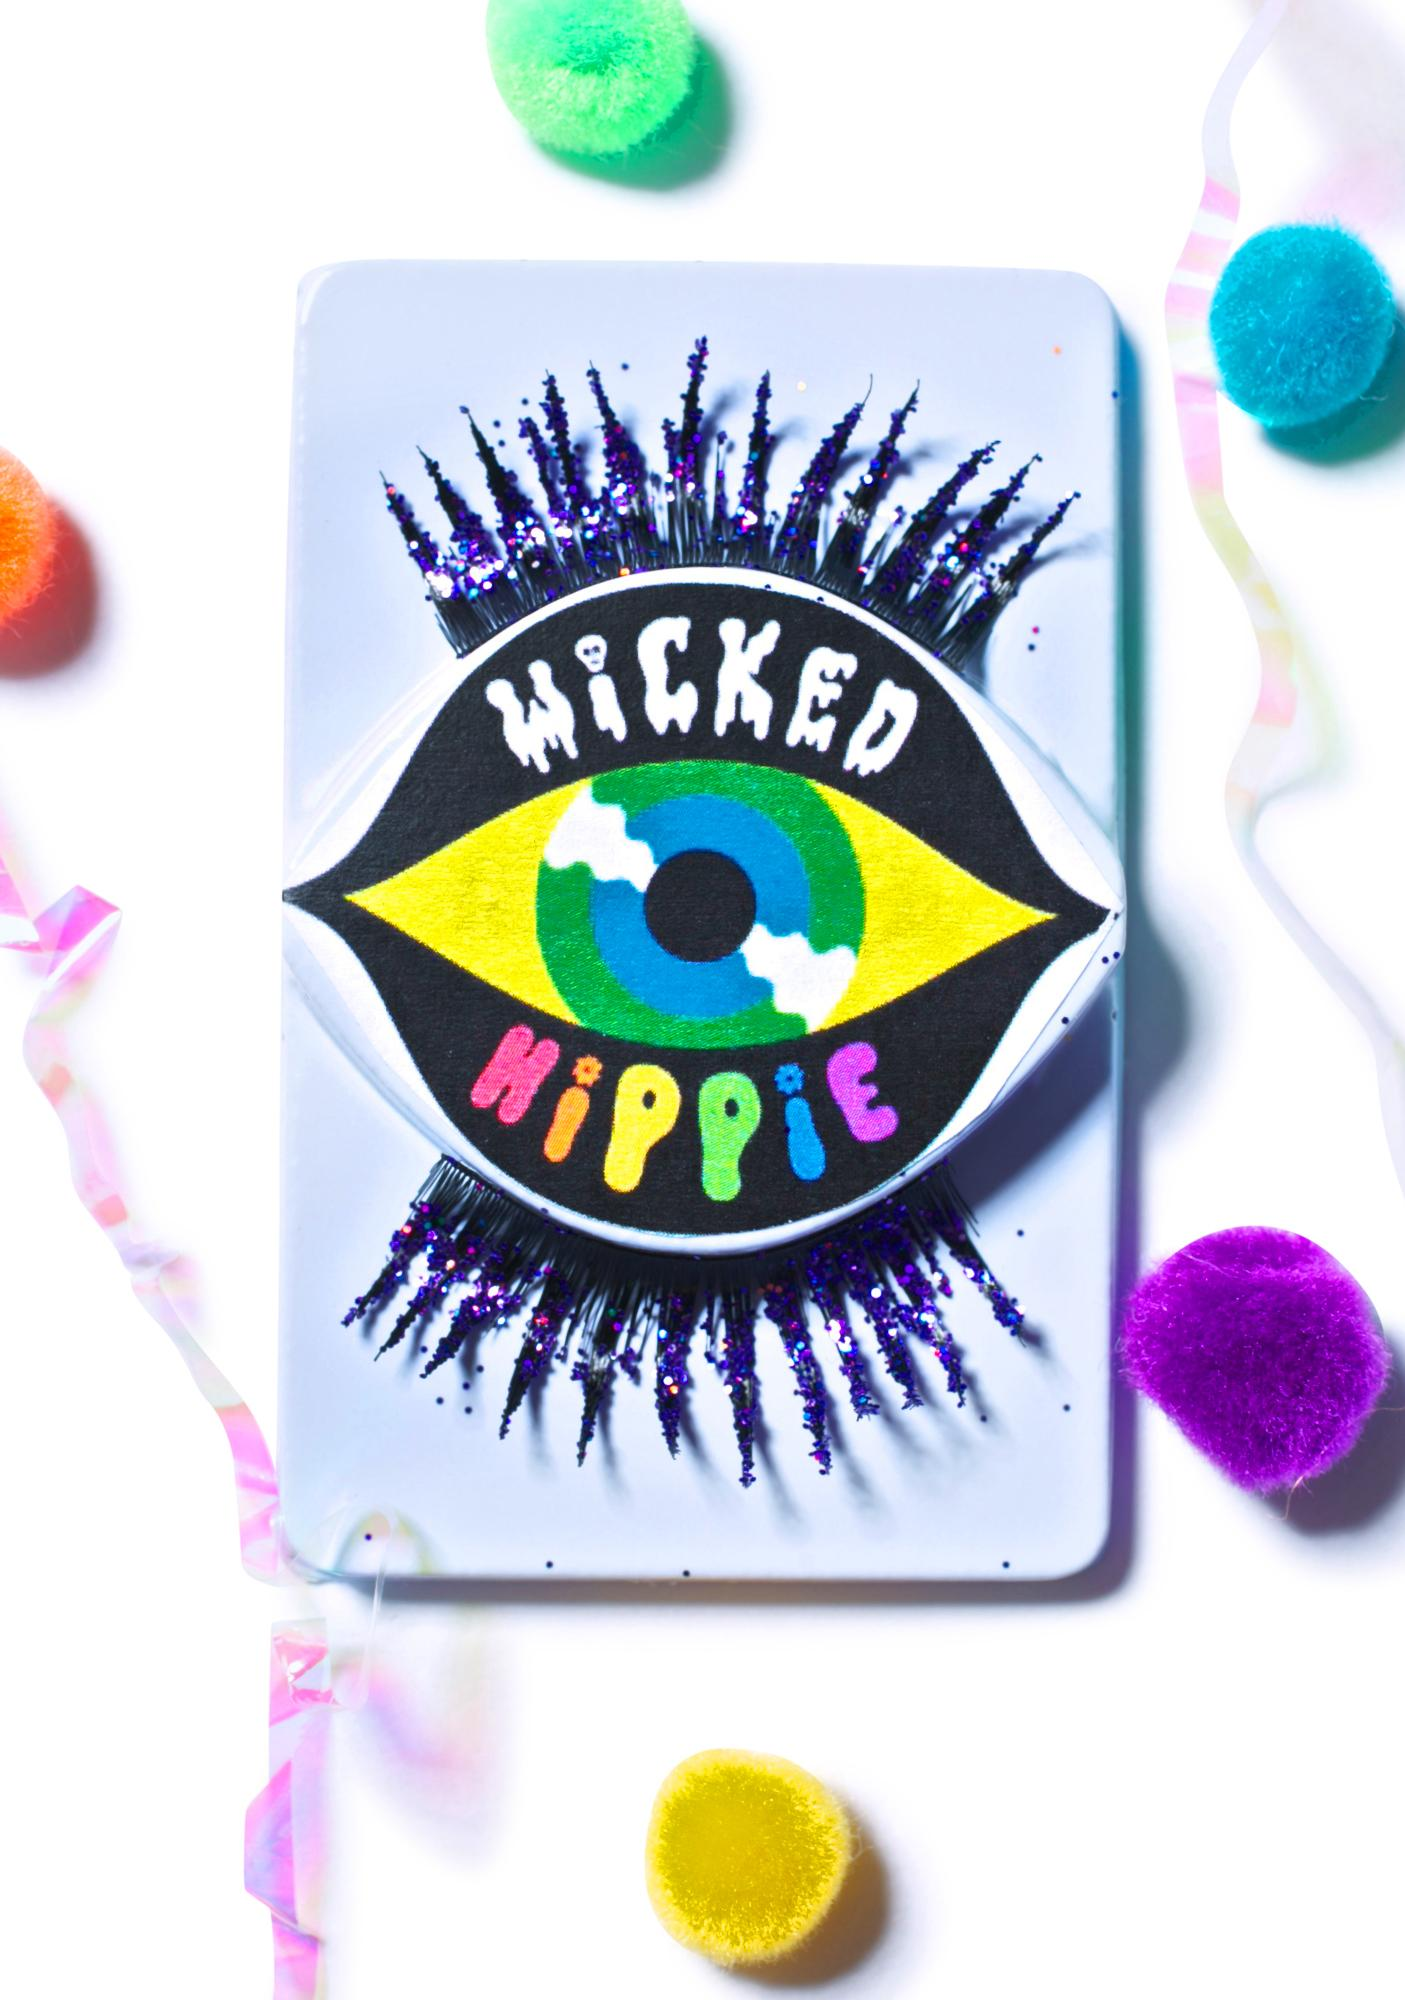 Wicked Hippie x Dolls Kill Mercy Glitter Death Lashes